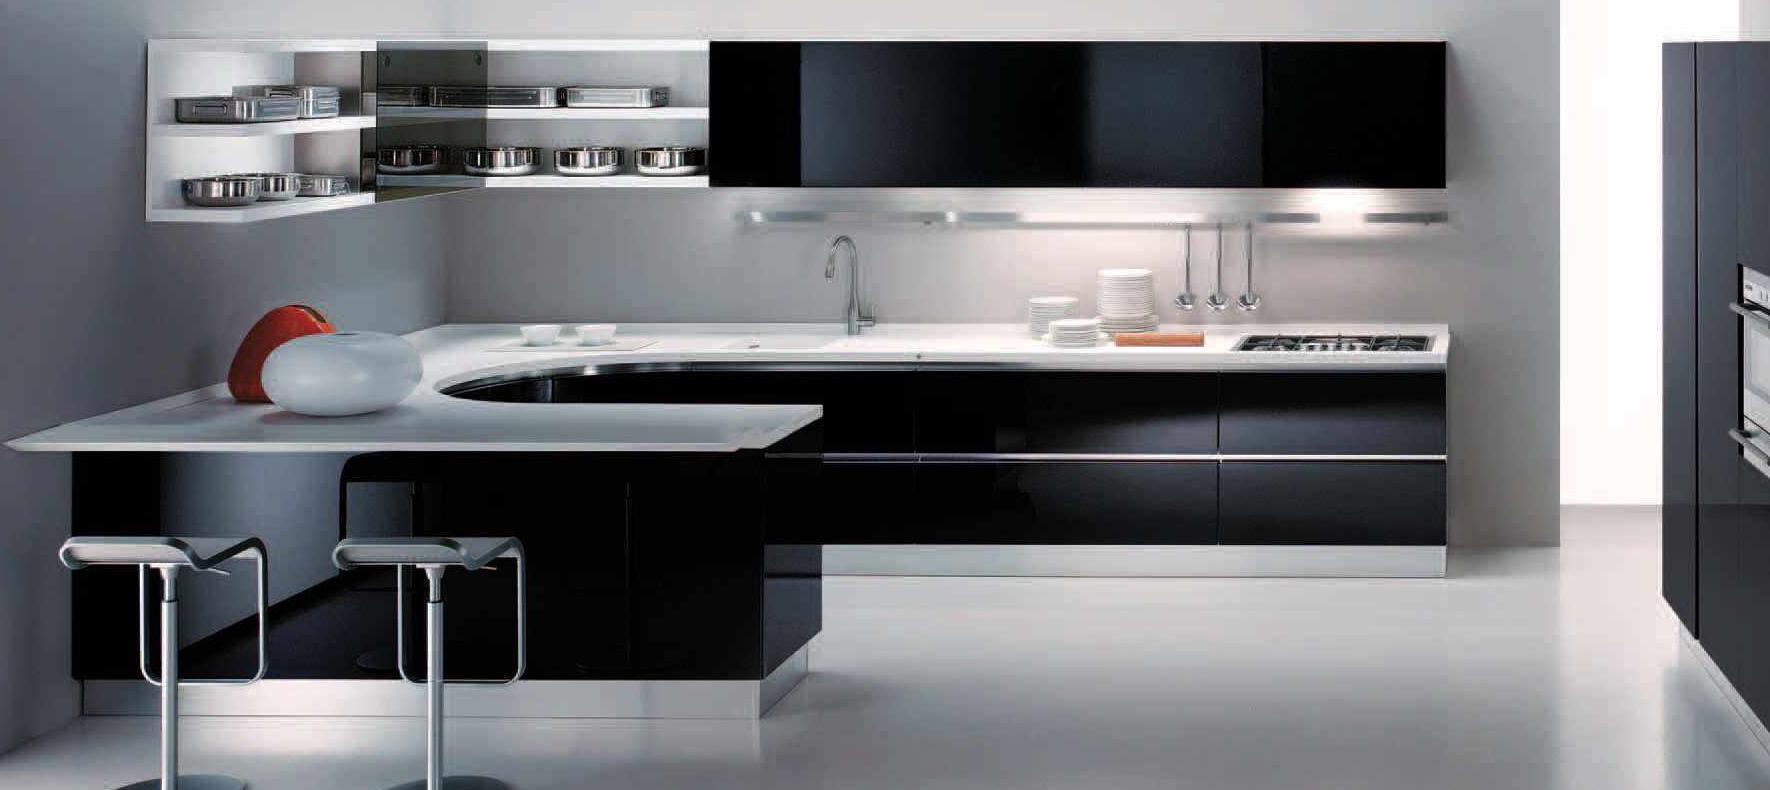 italian kitchens from giugiaro designs. italian modern kitchen